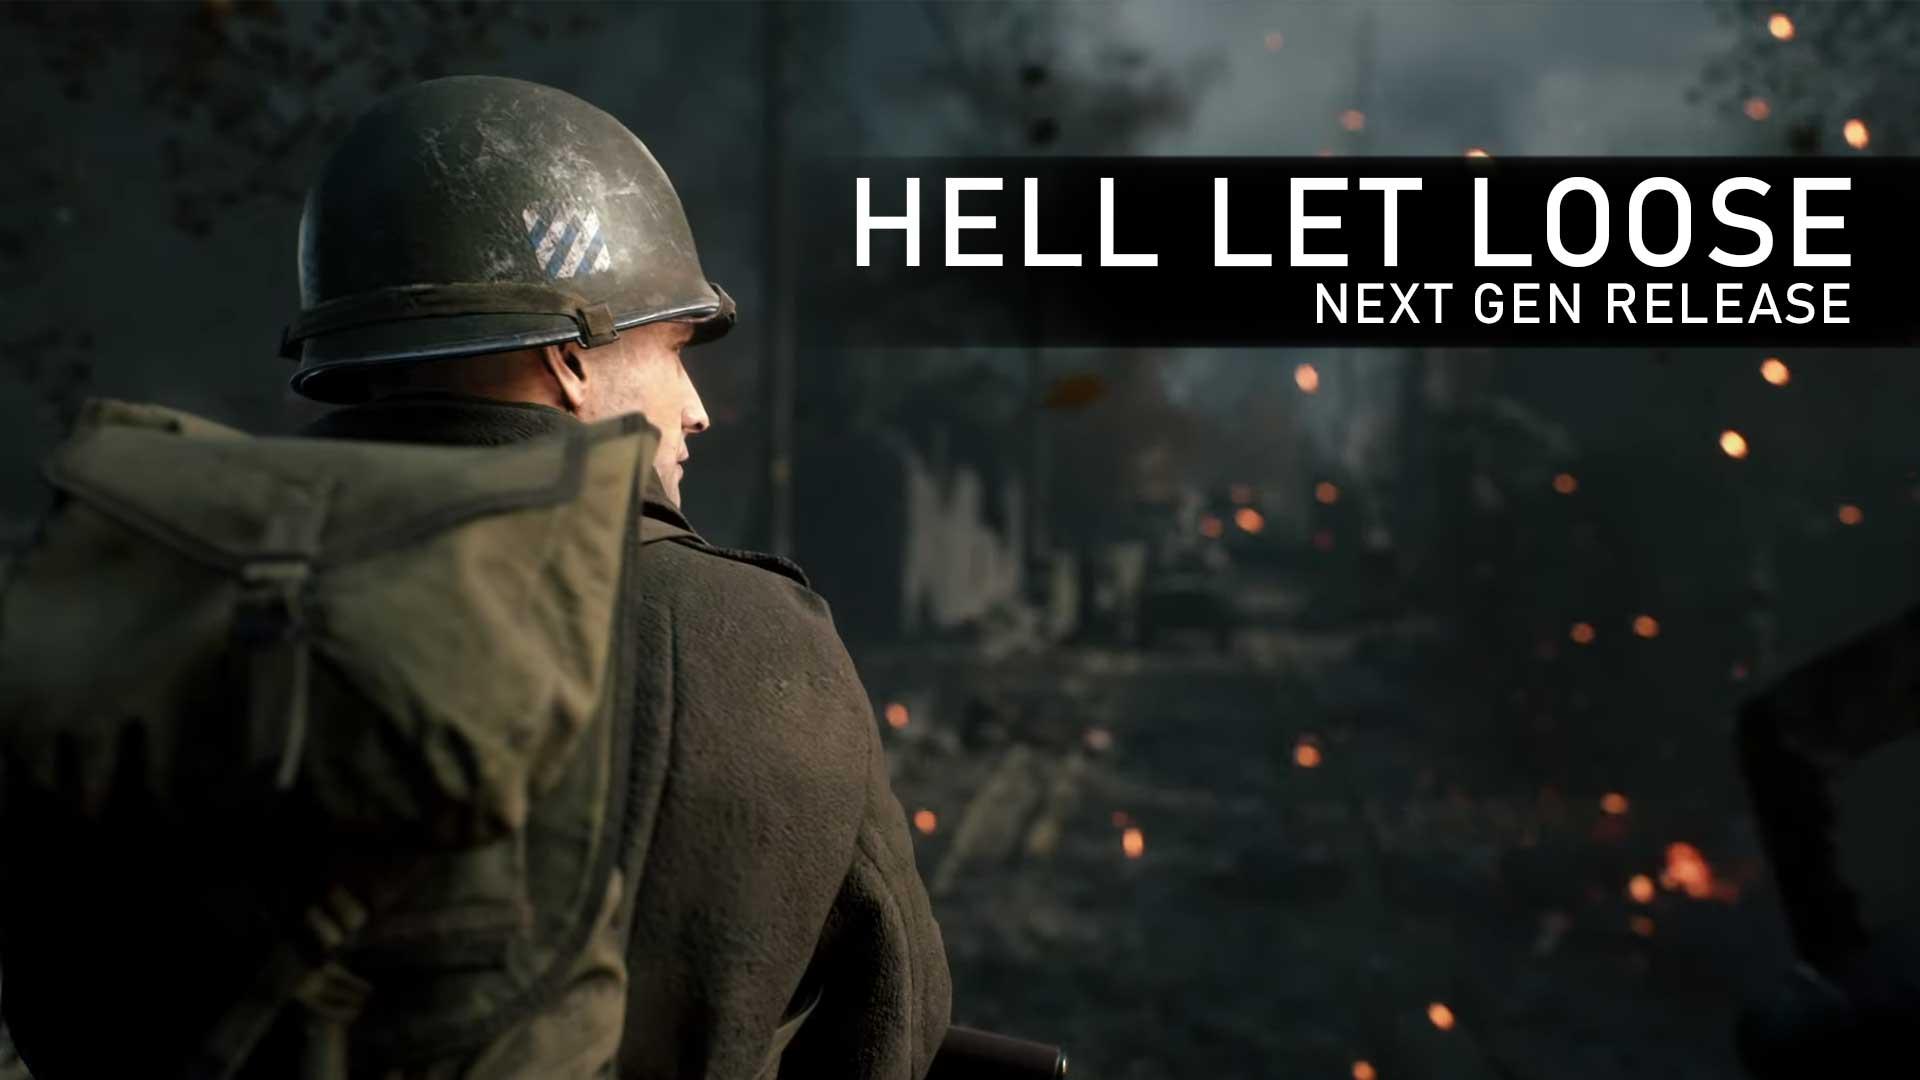 hell let loose next gen release